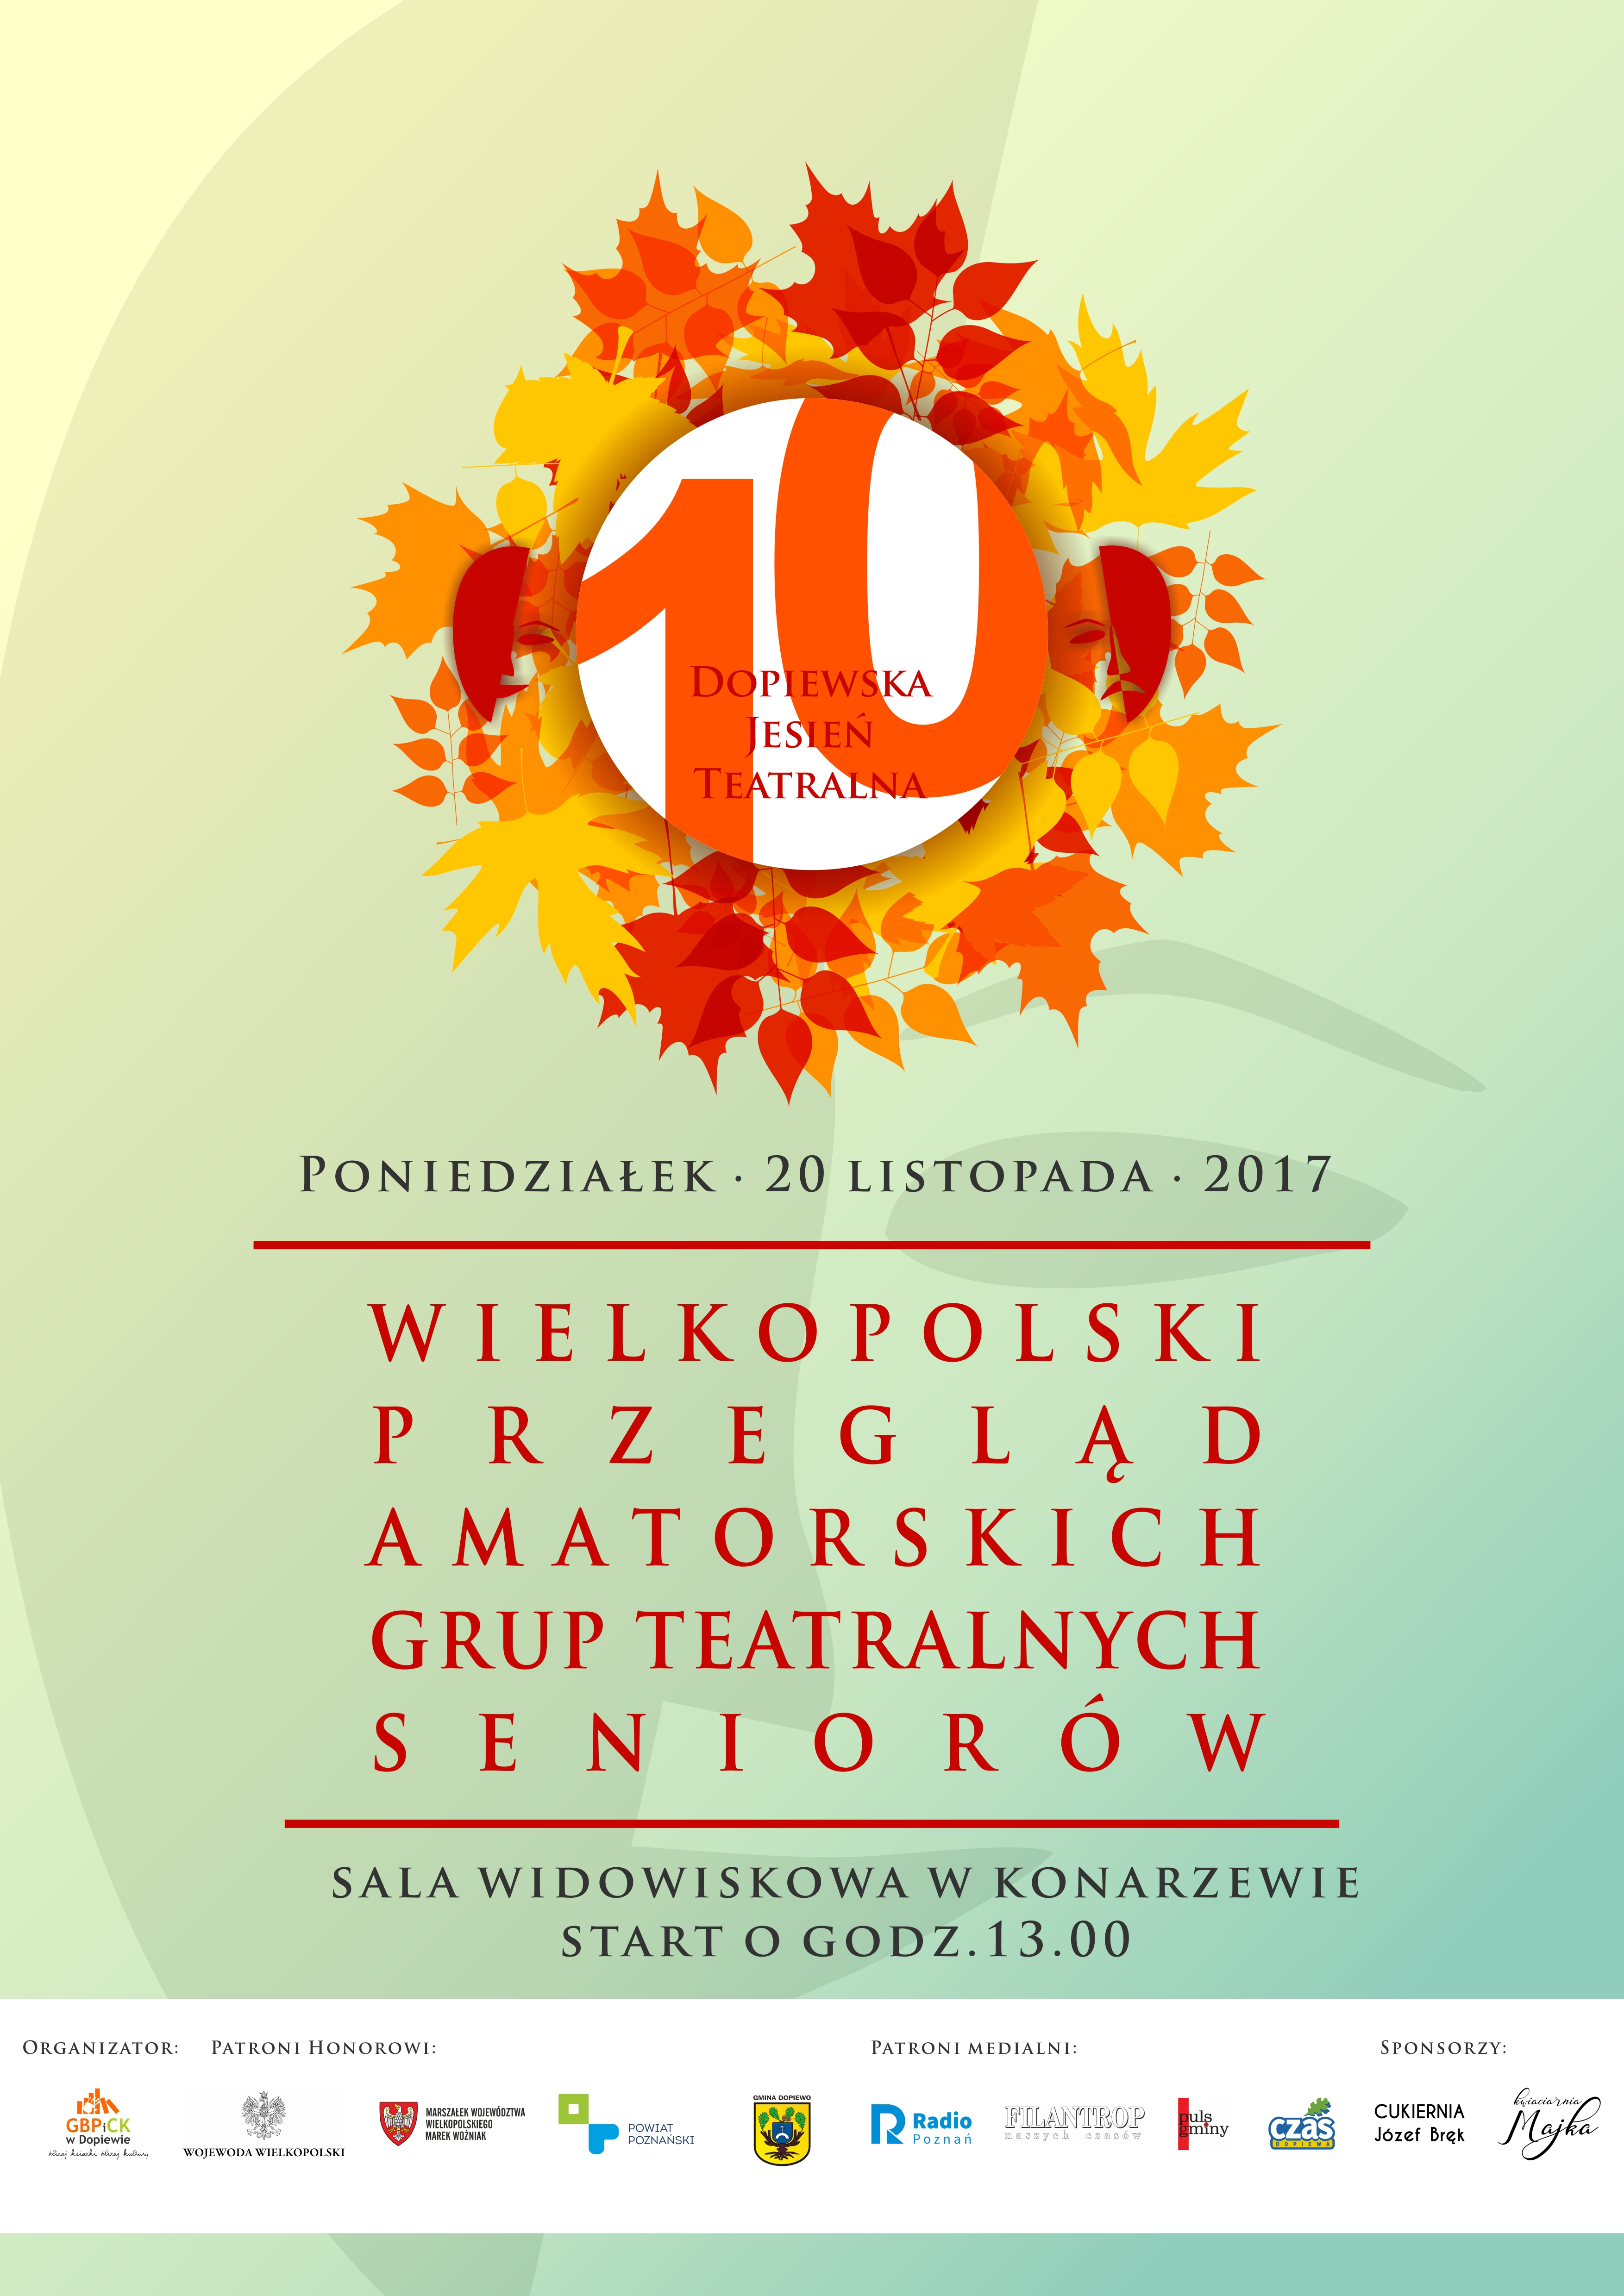 Dopiewska Jesień Teatralna